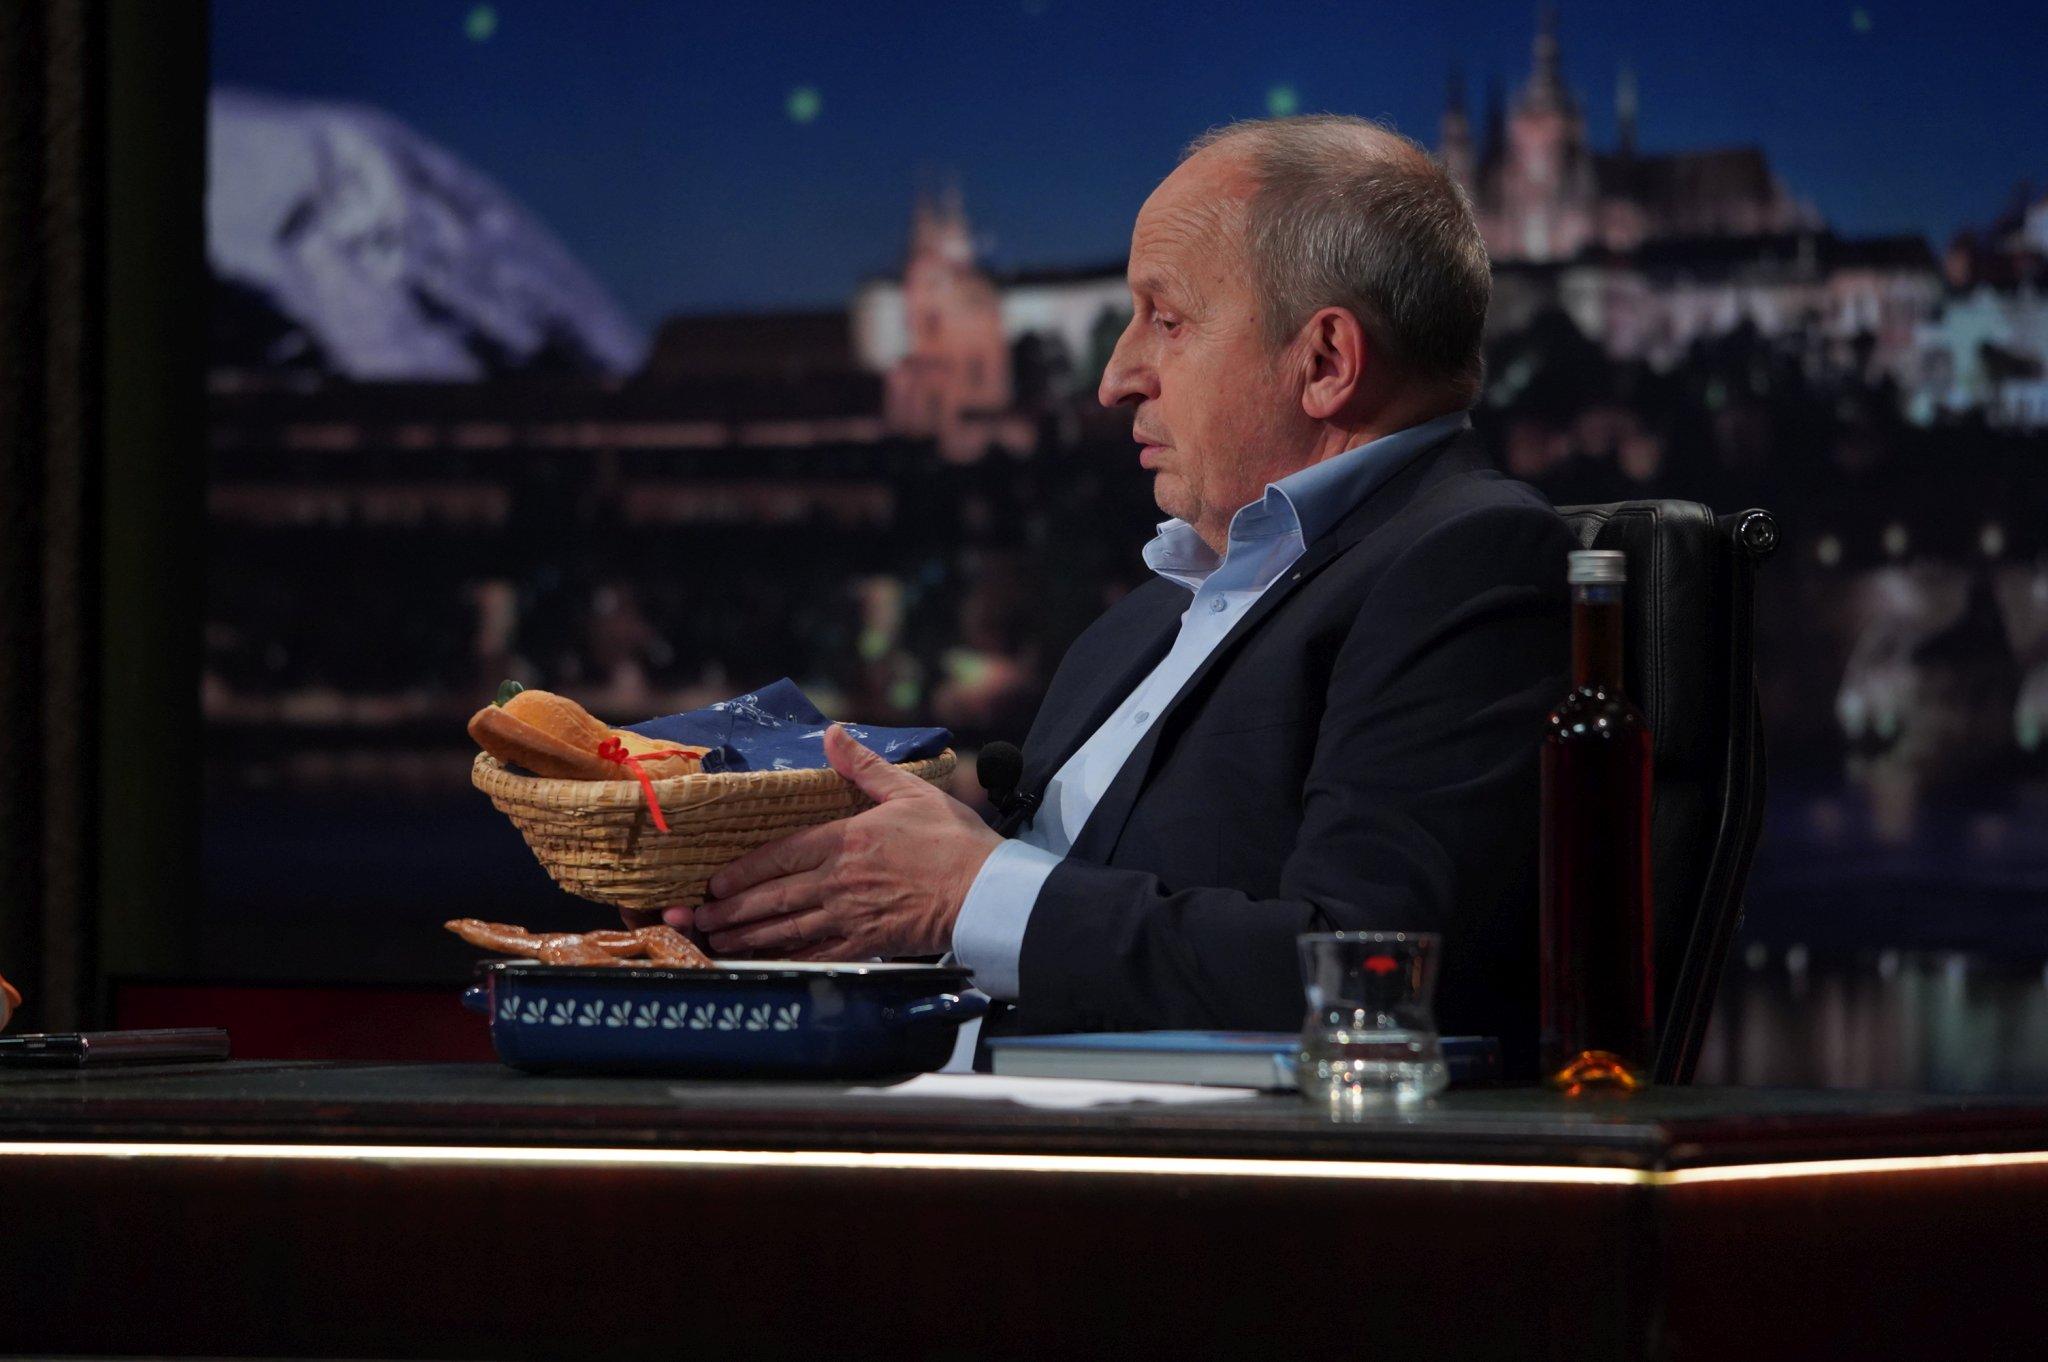 Moderátor Jan Krause s výslužkou od cukrářky Petry Burianové v SJK 28. 4. 2021